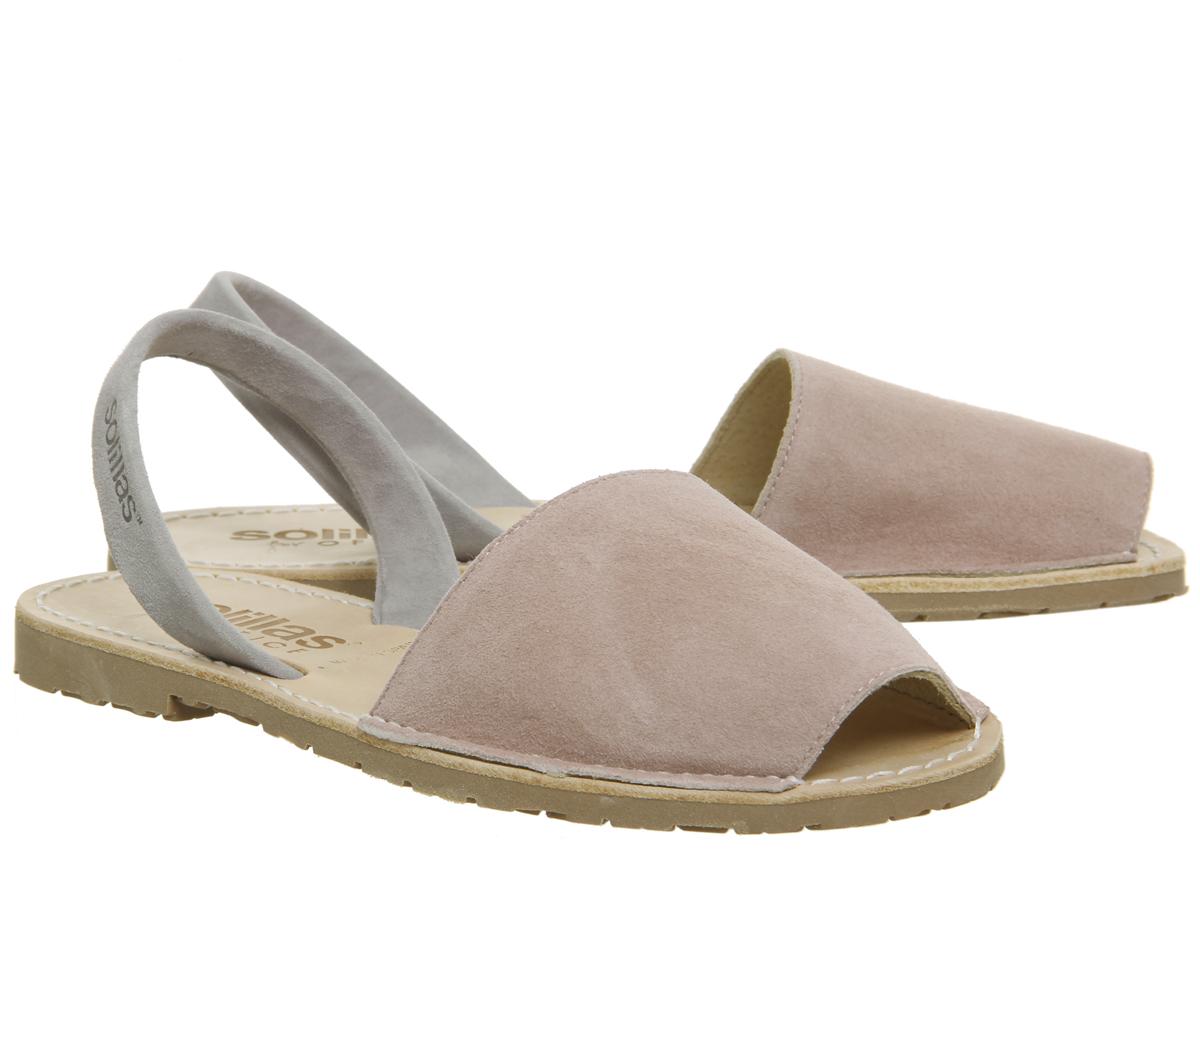 4217e04d582a Womens-Solillas-Solillas-Sandal-Pink-Grey-Sandals thumbnail 13